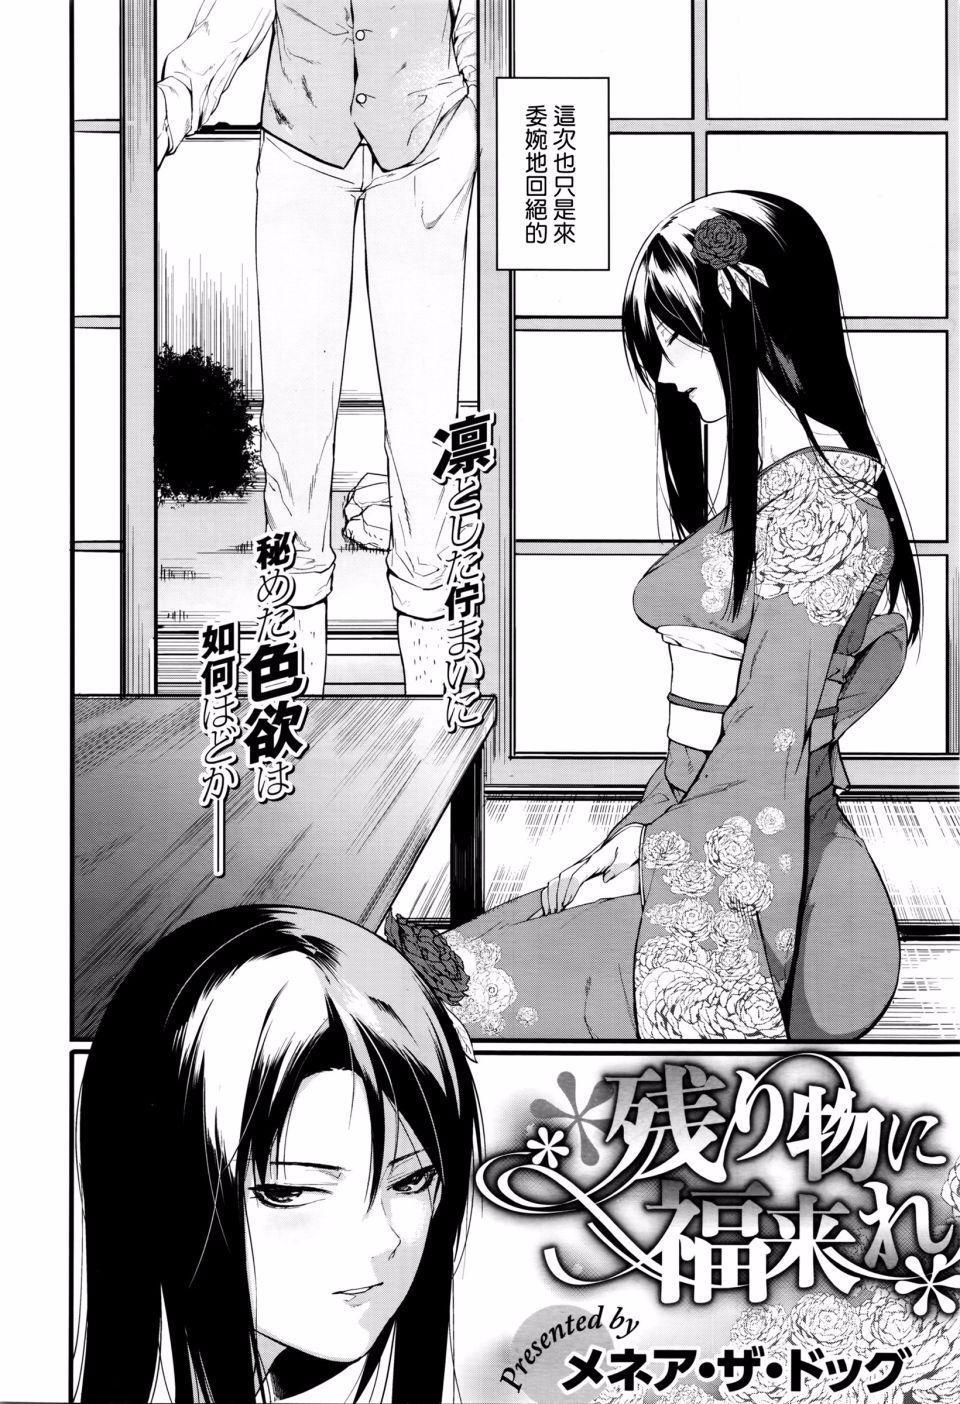 Fukurai Re to leftovers 1